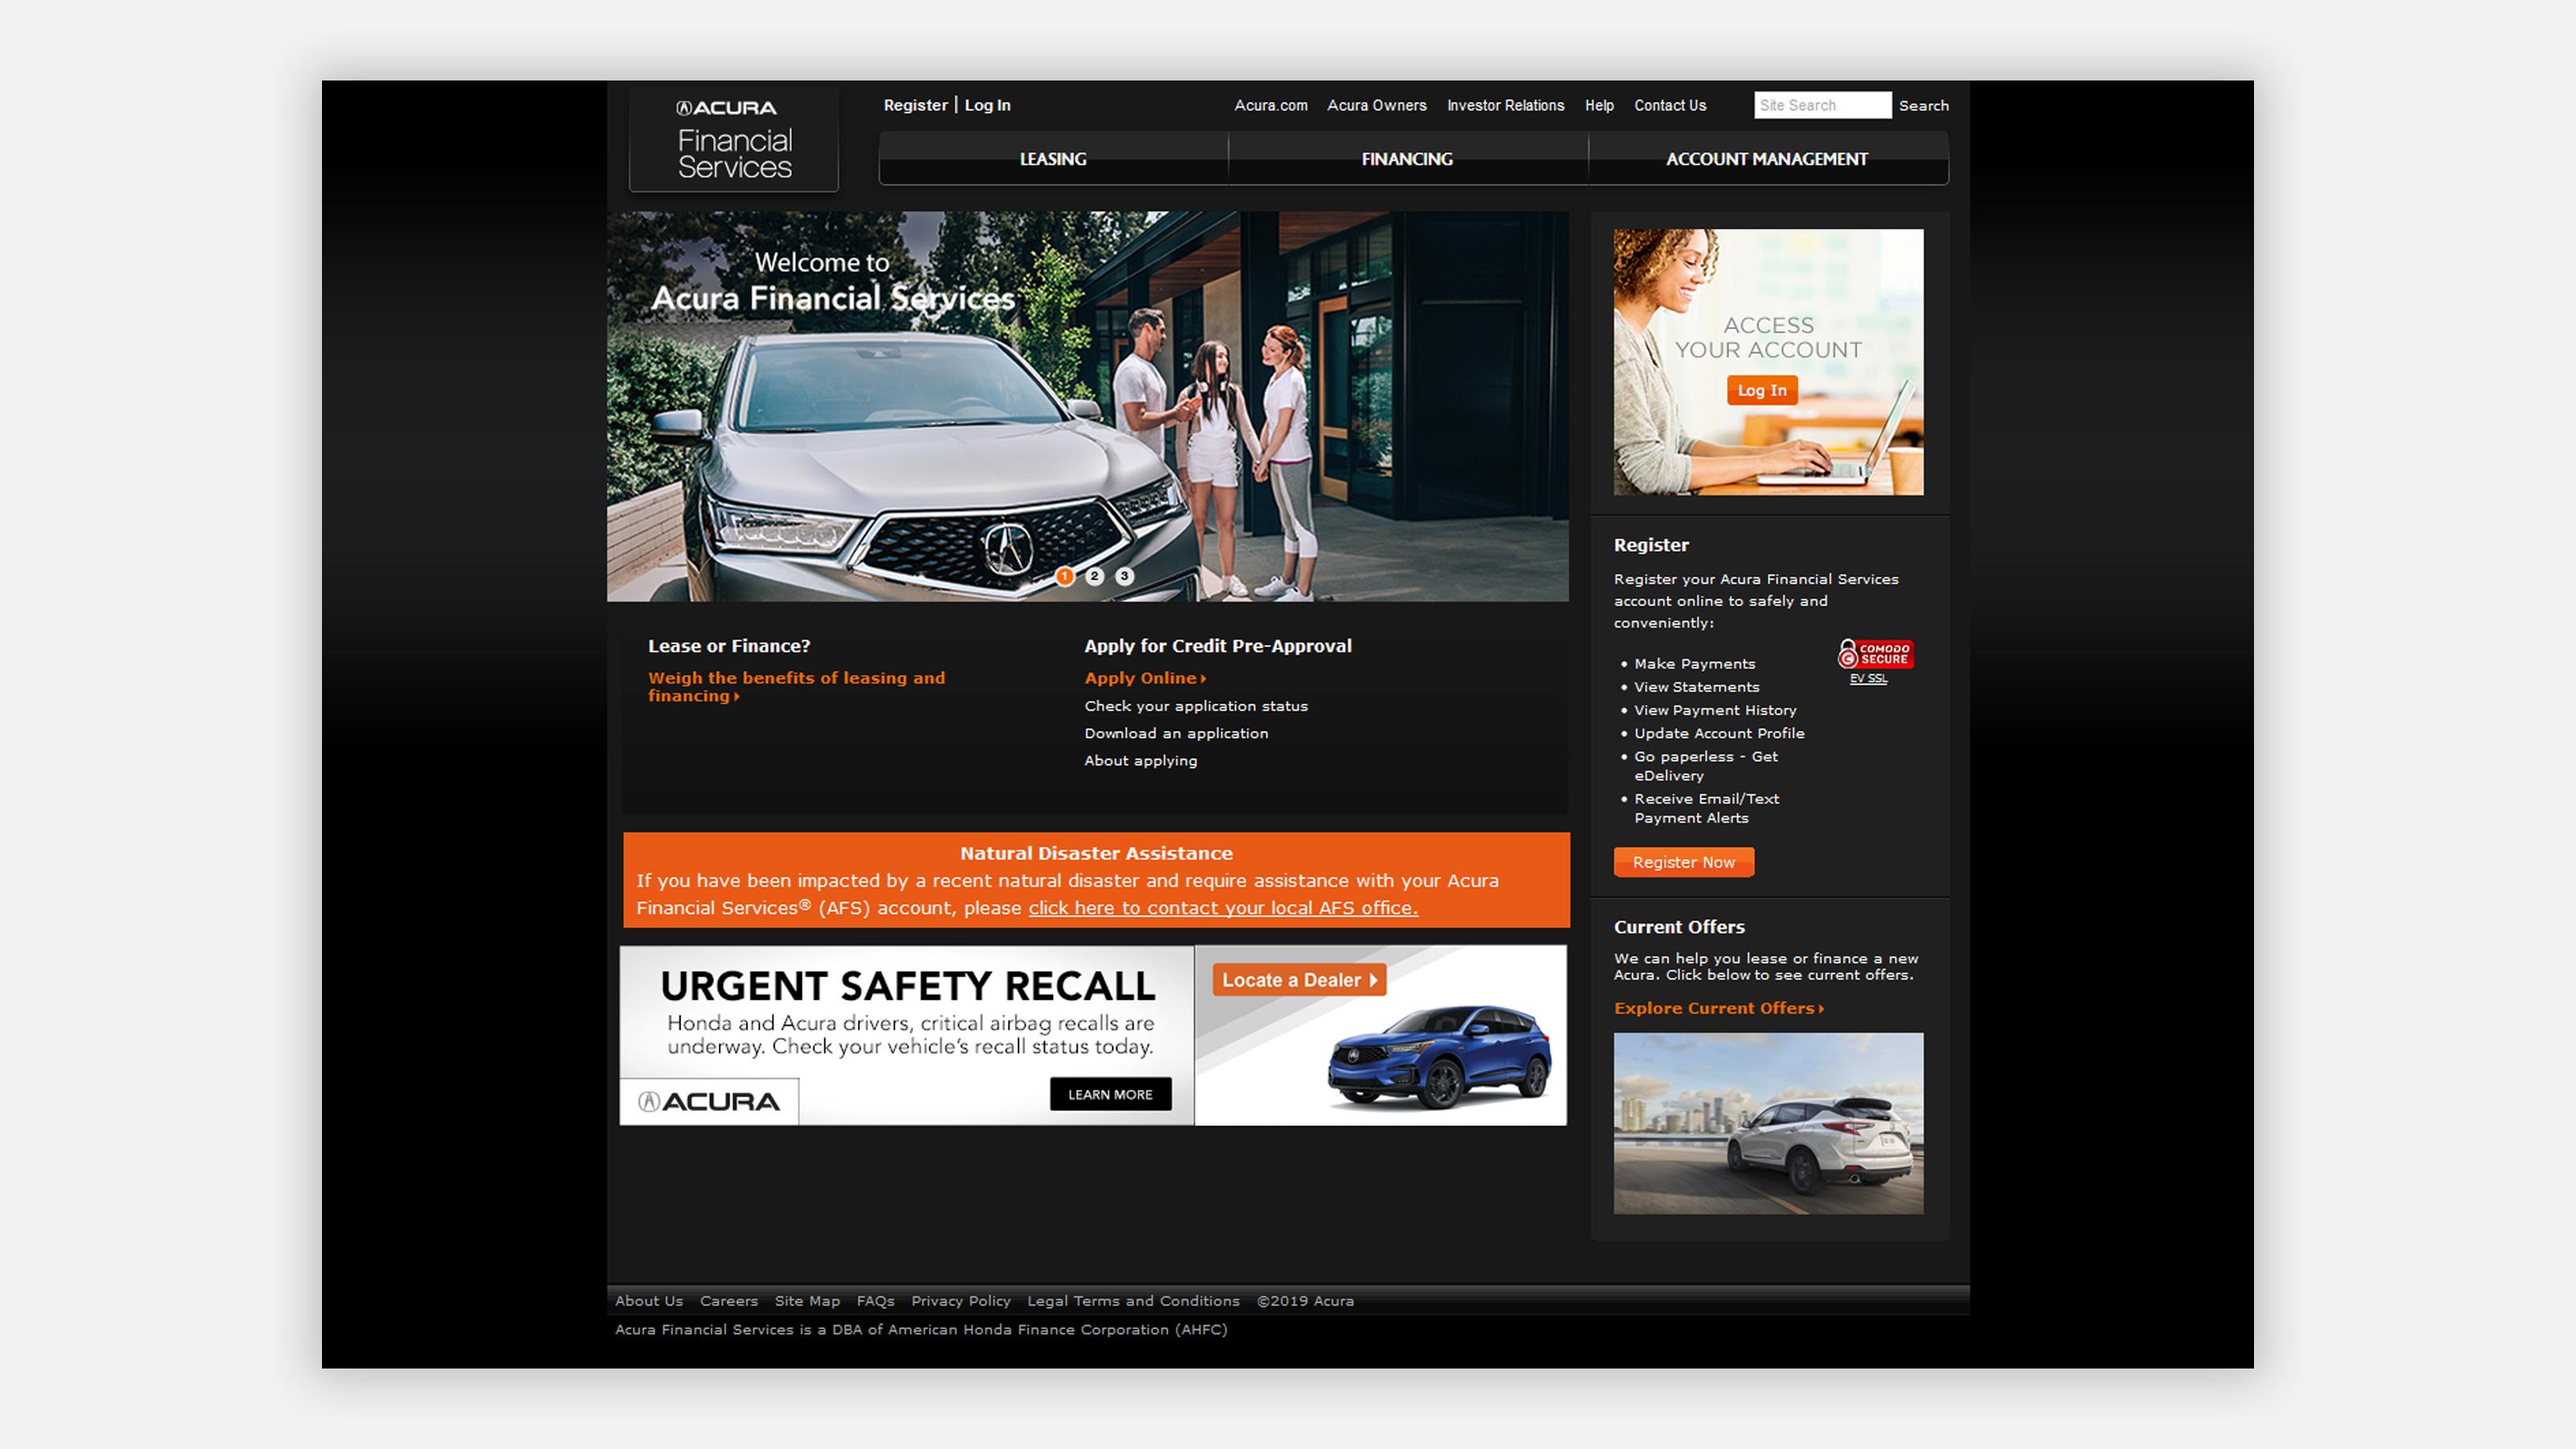 Acura financial services website on desktop